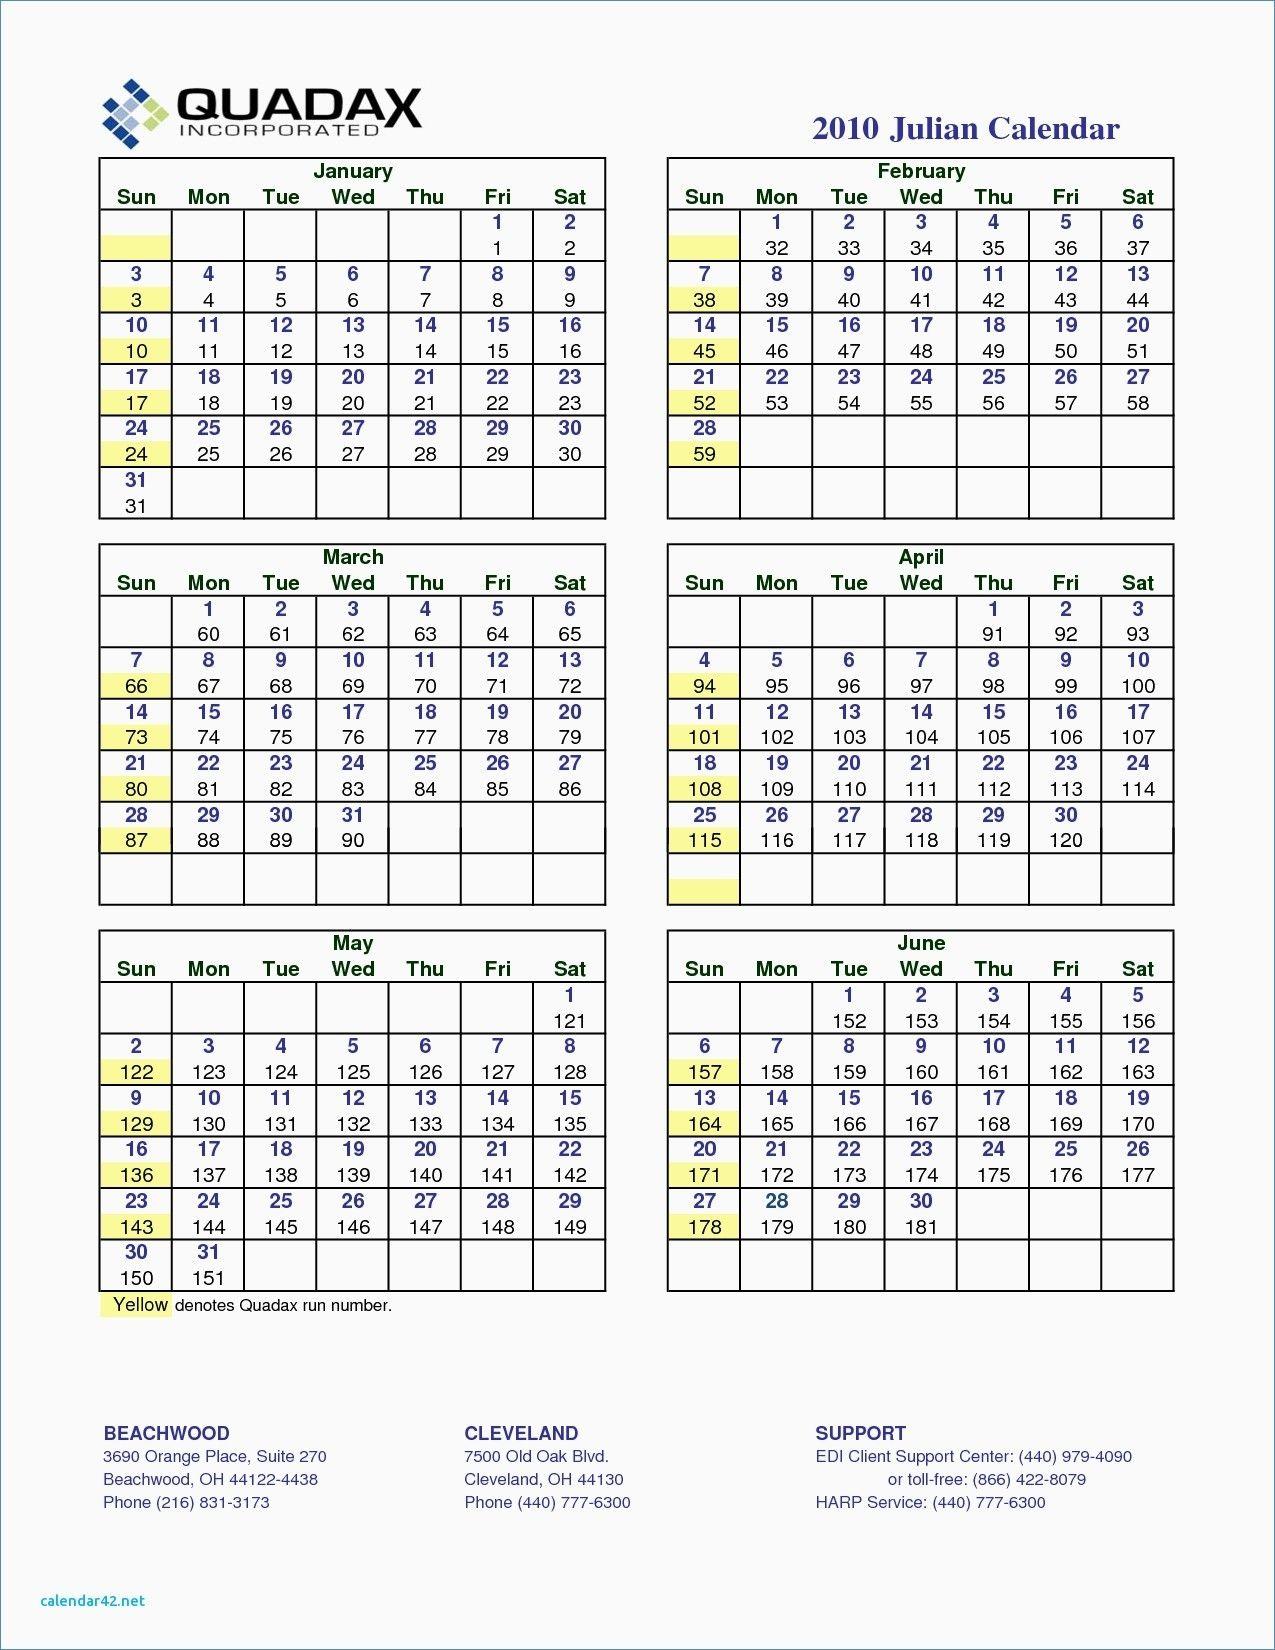 Julian Calendar 2019 Quadax July 2018 Calendar Sri Lanka for Calendario Juliano 2020 Quadax